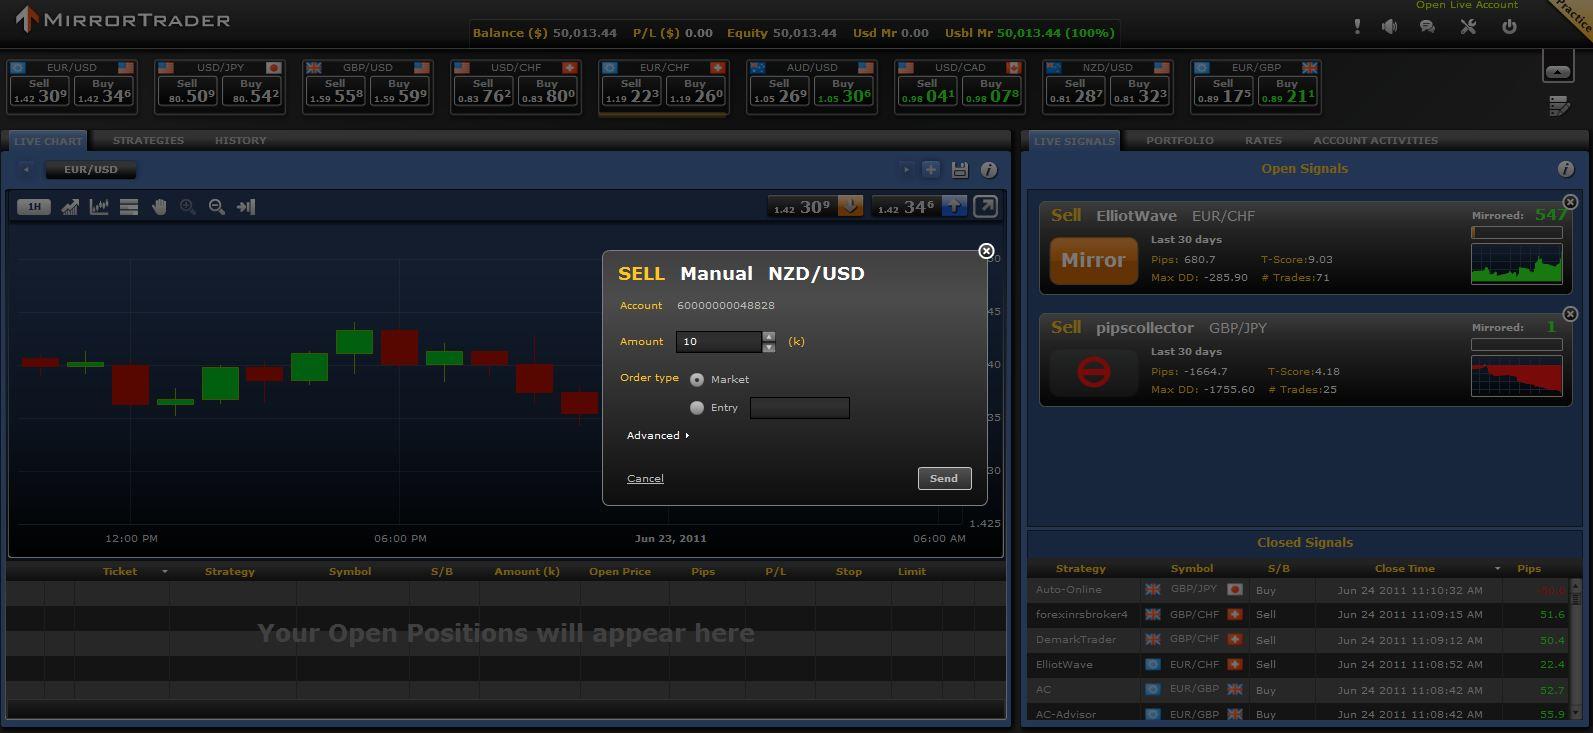 fxcm tradency